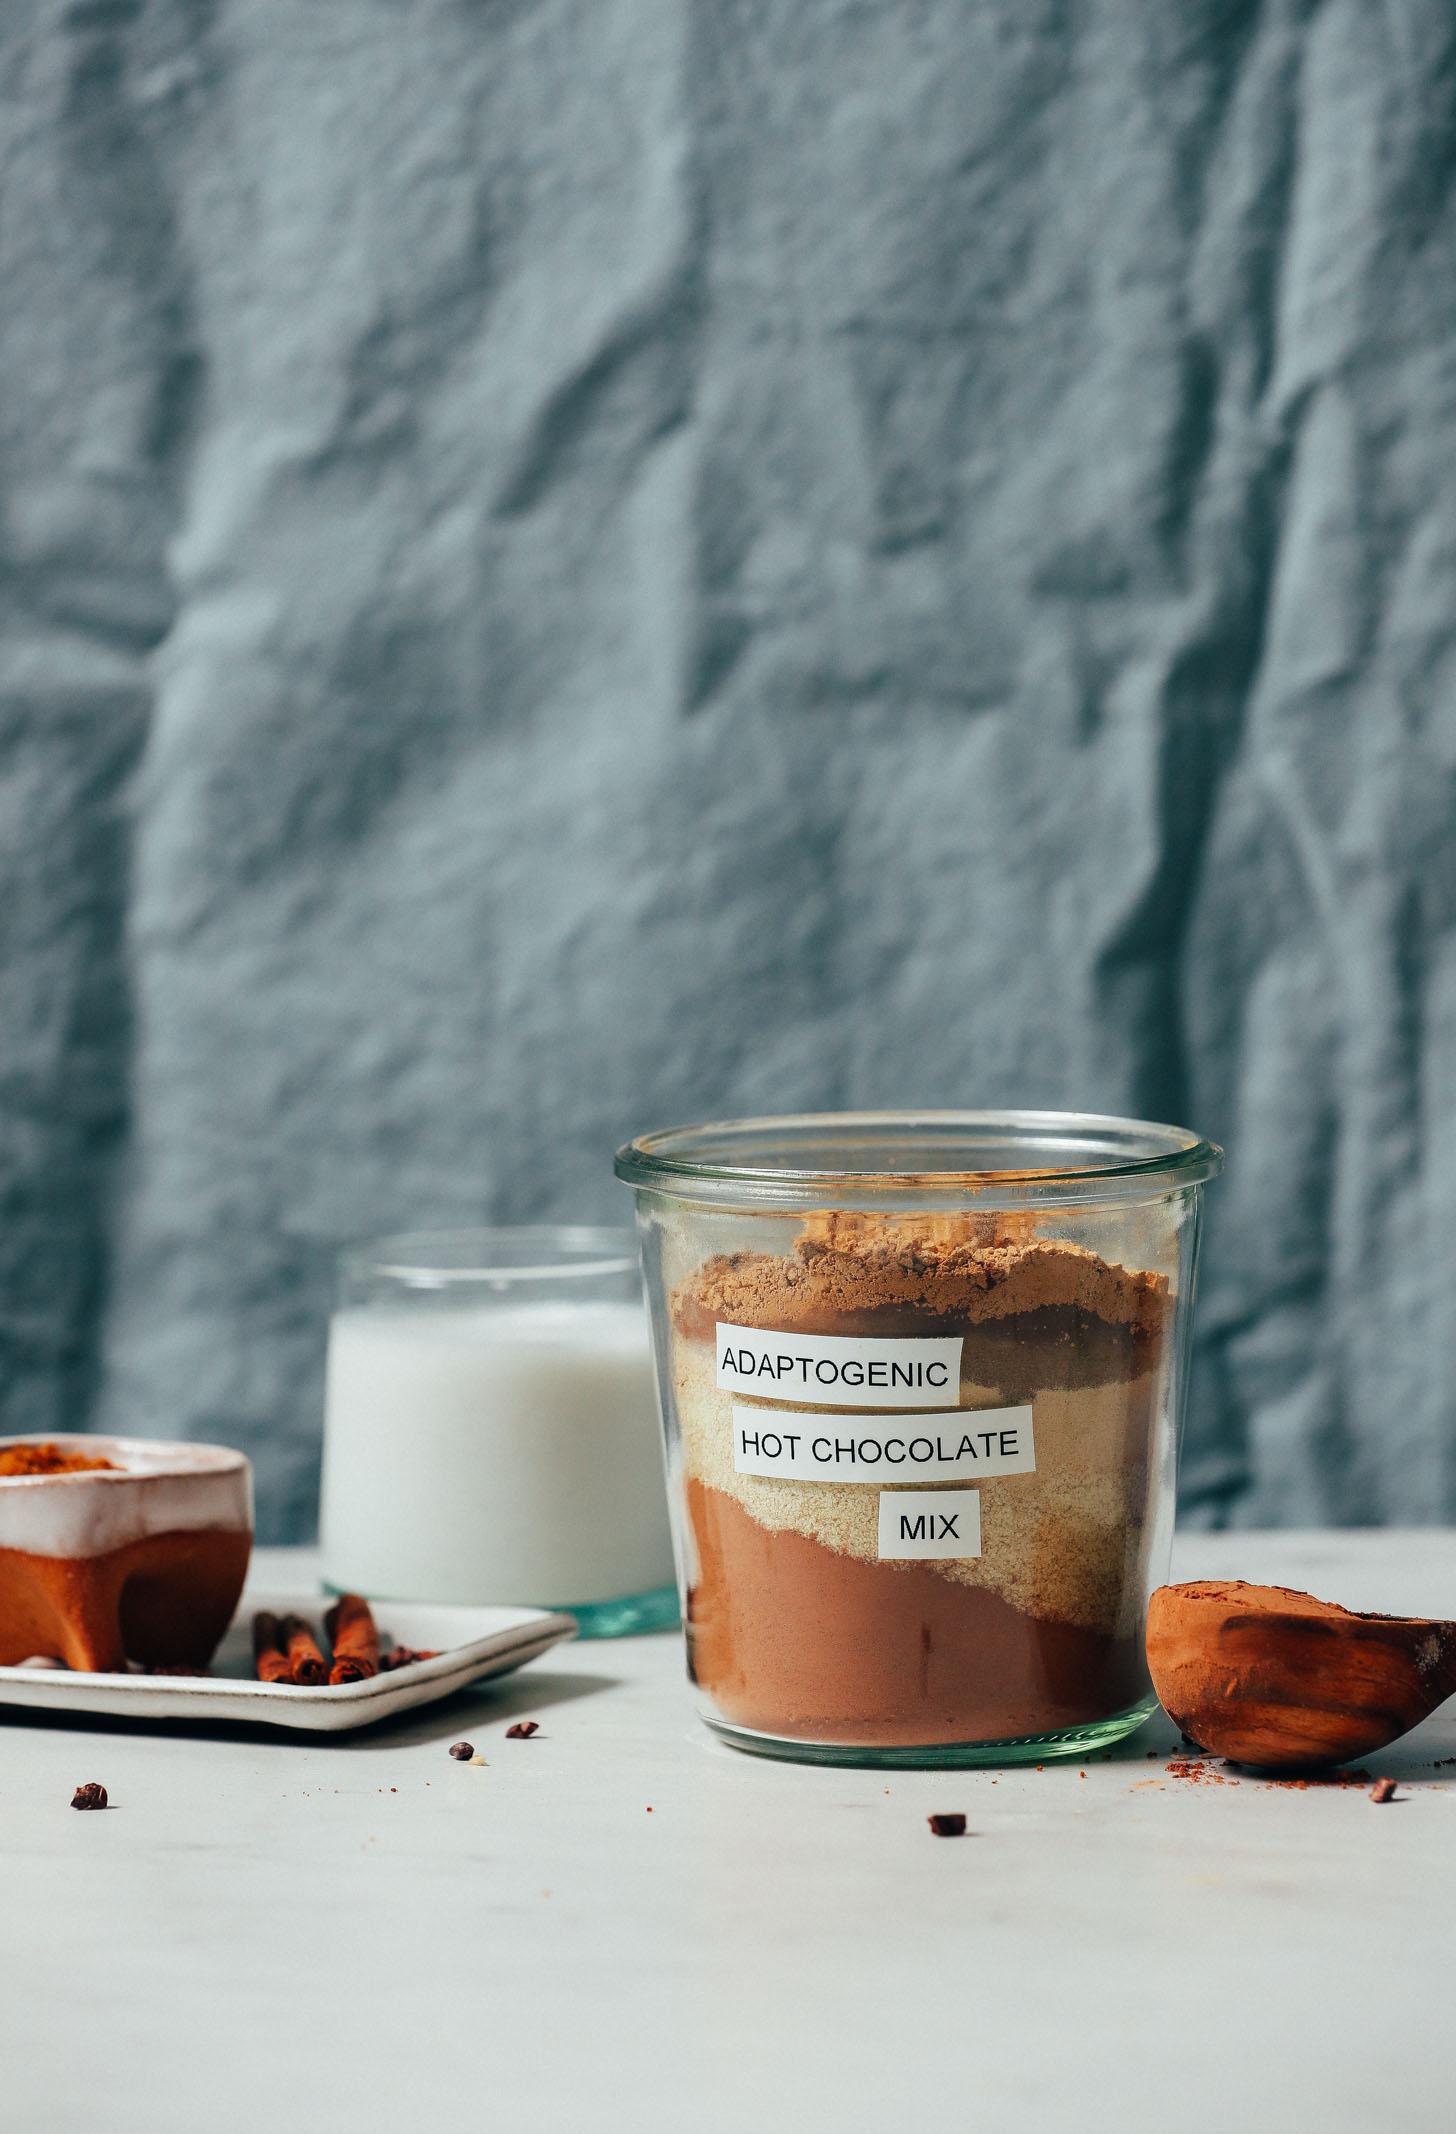 Cinnamon sticks, cacao powder, almond milk, and coconut sugar beside a jar of Adaptogenic Hot Chocolate Mix